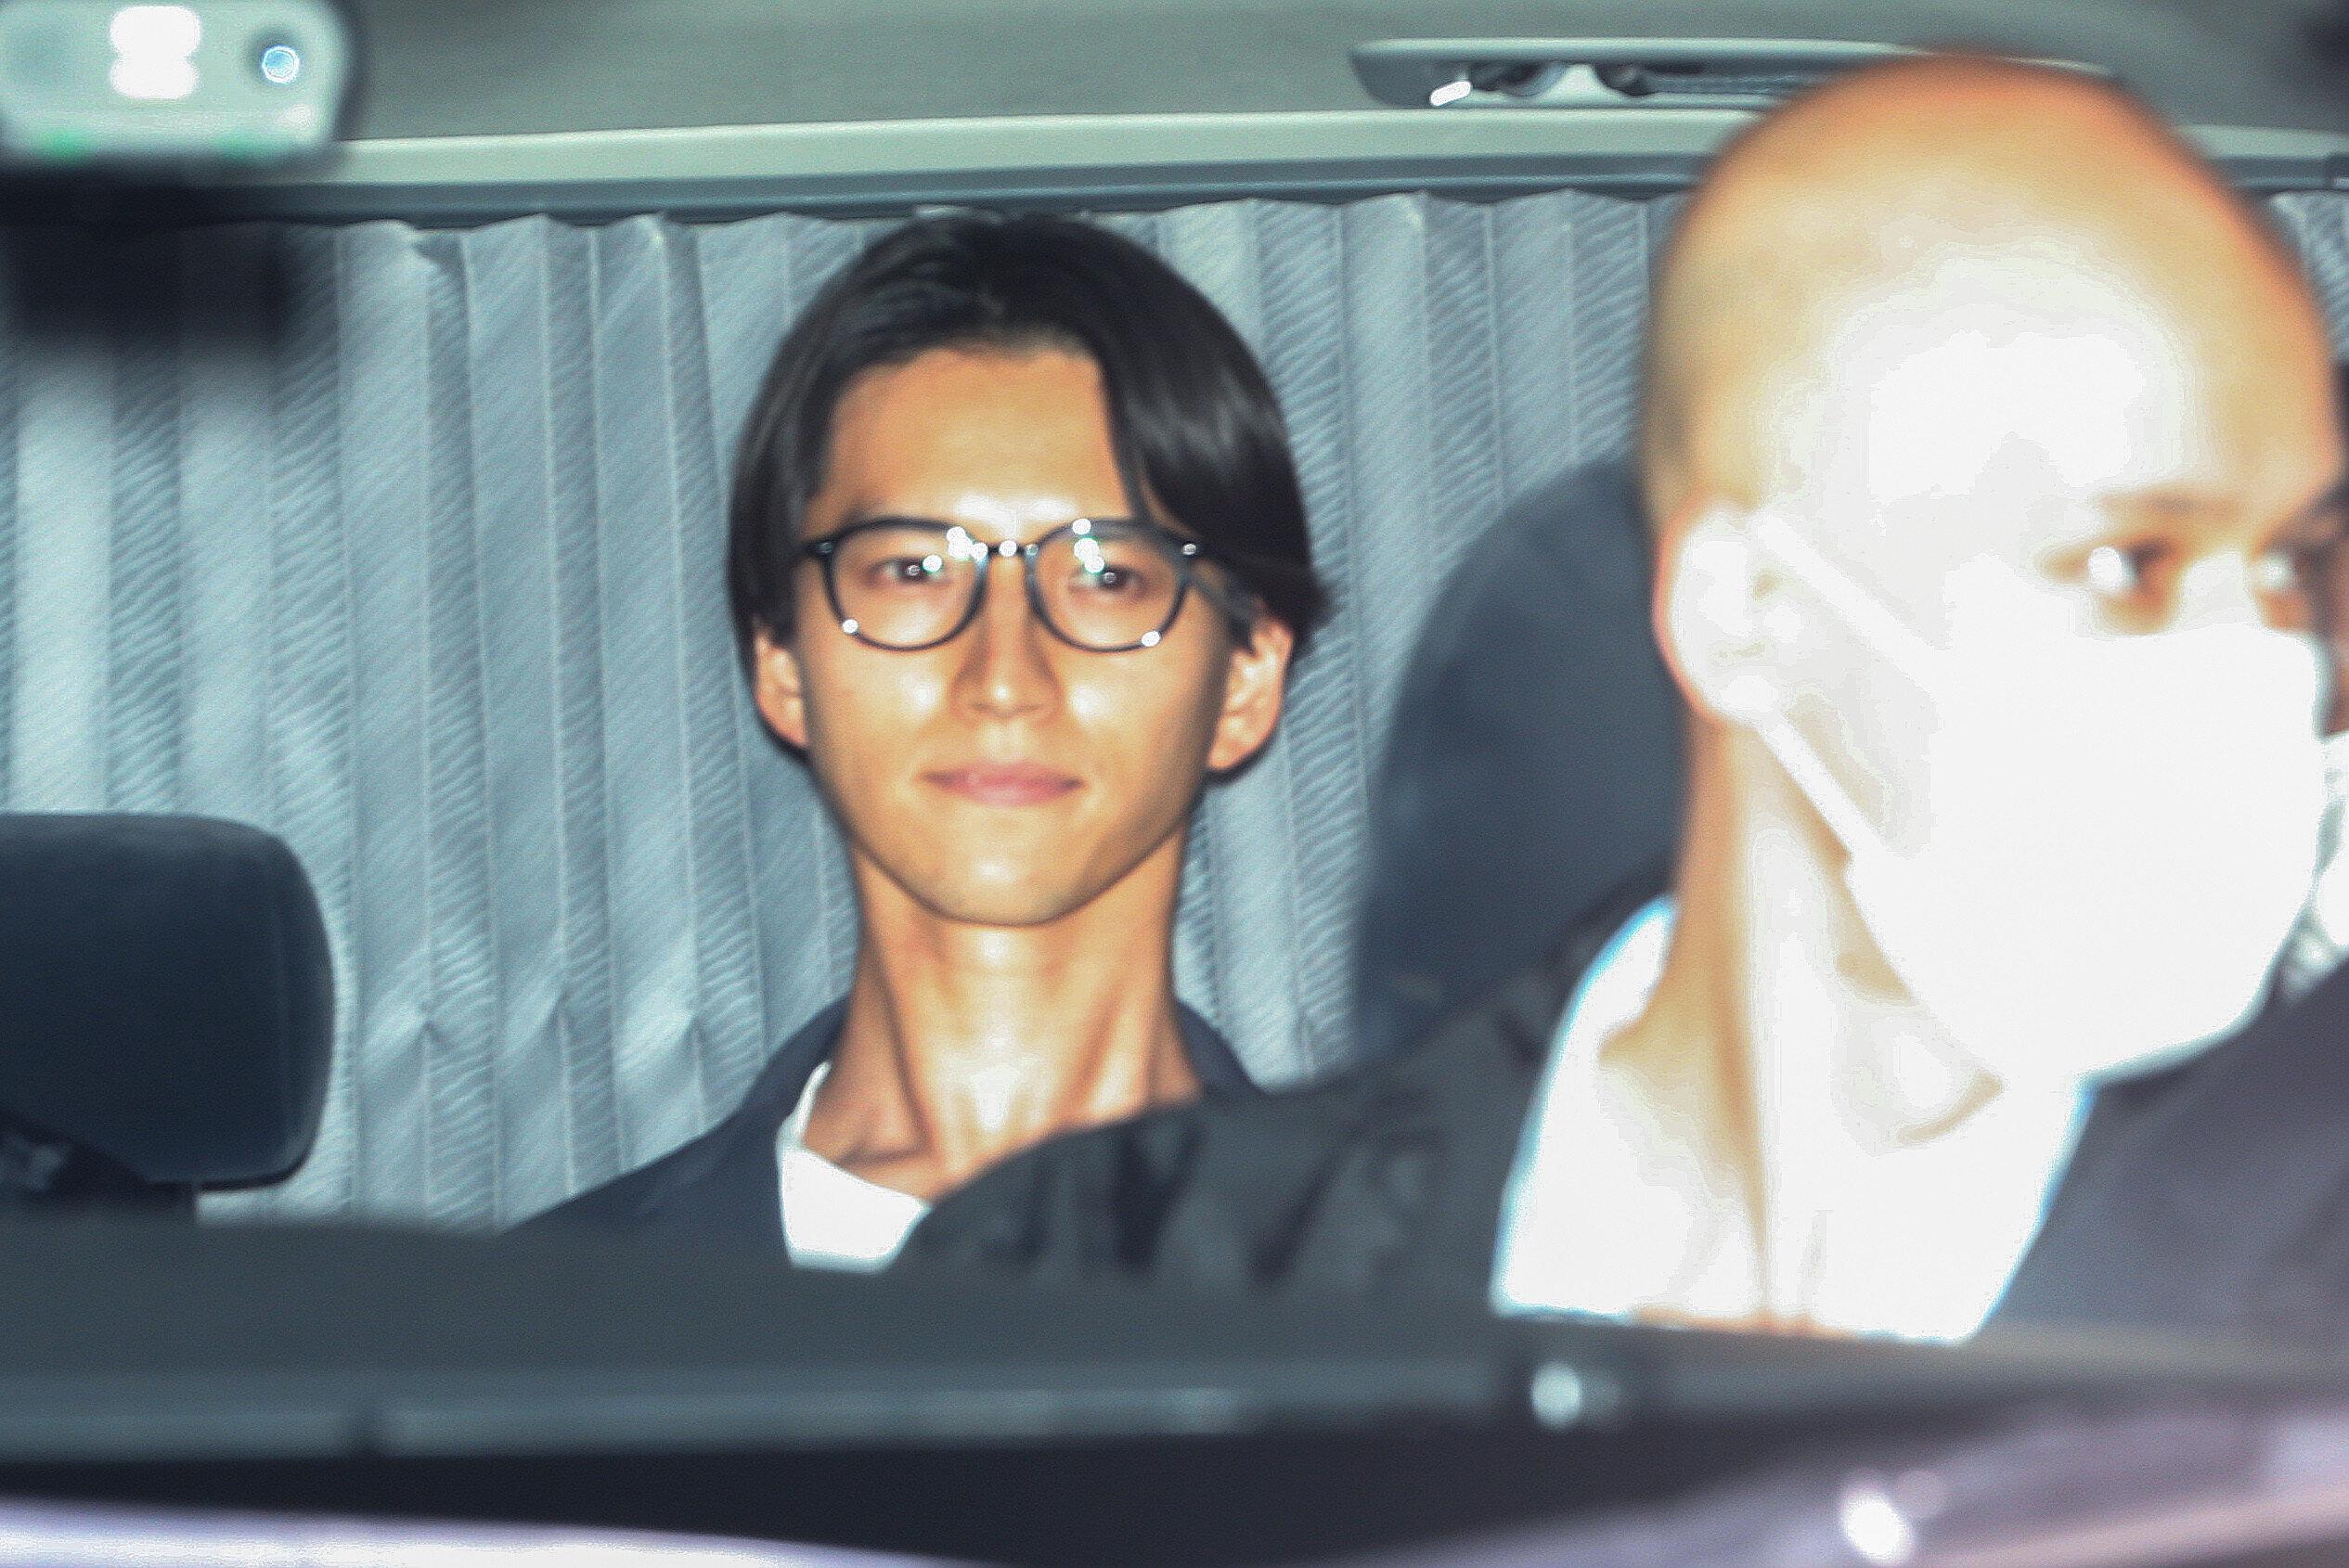 KAT-TUN中丸雄一さん 田口淳之介容疑者の逮捕に「KAT-TUNだった頃のファンも裏切る行為だと分かっててやったのか」と言及